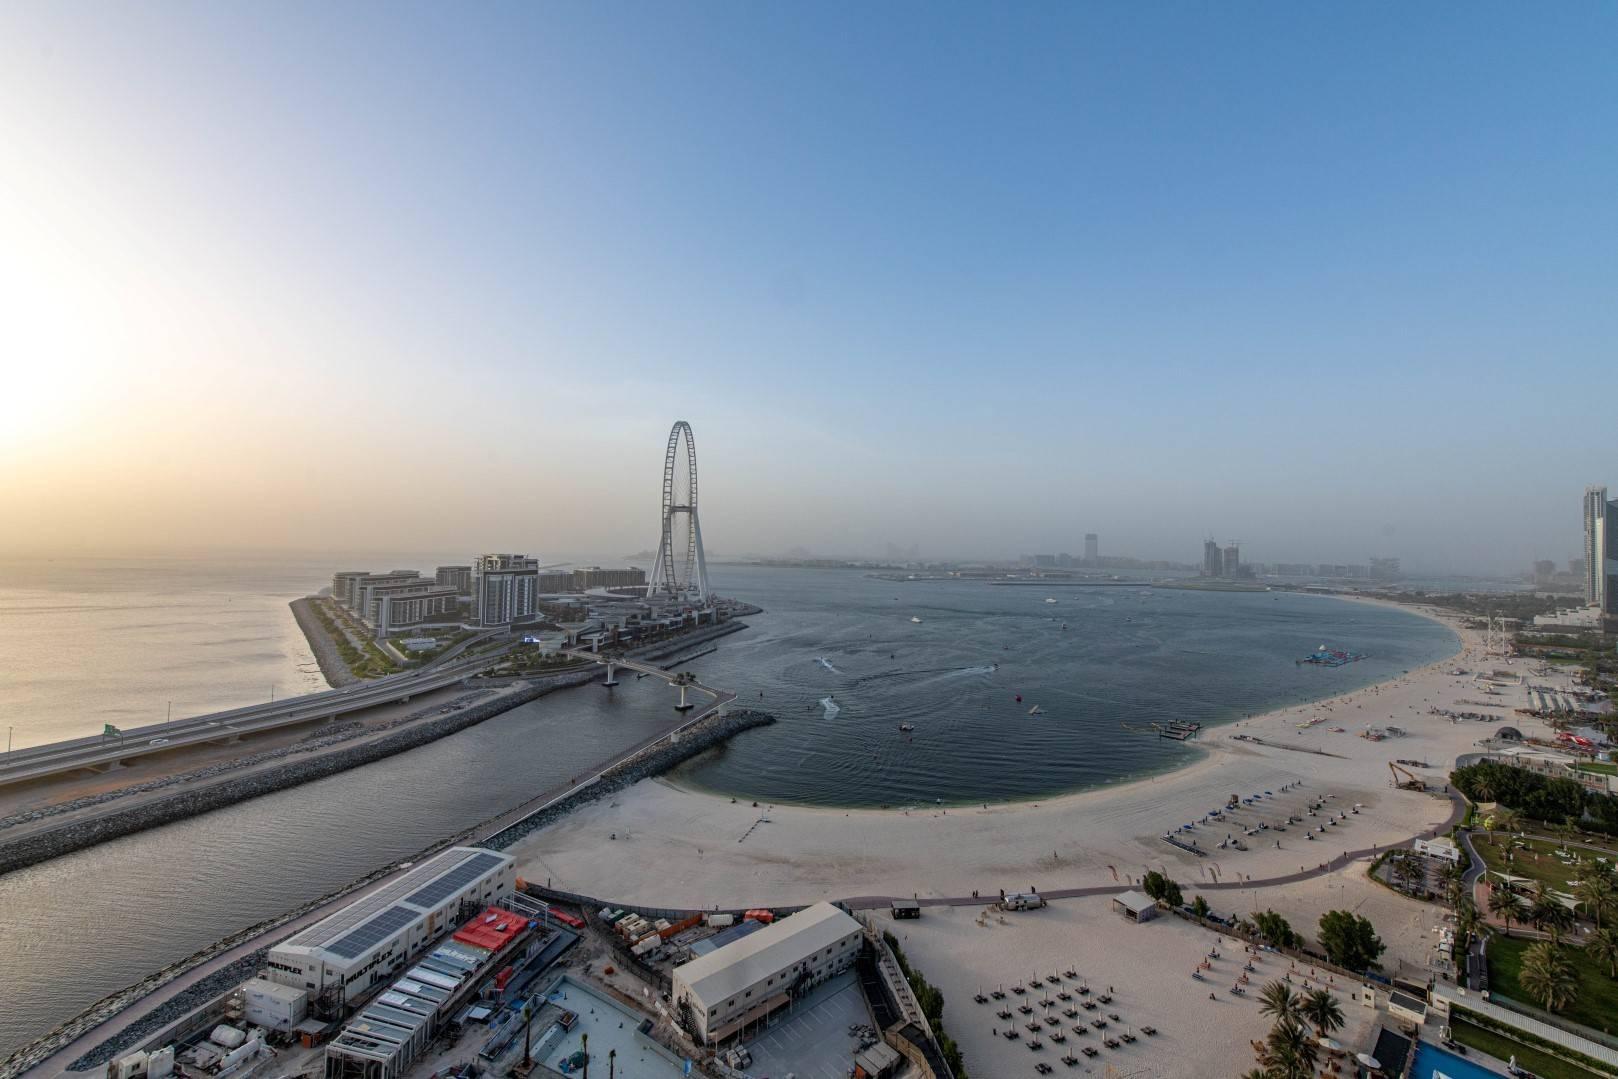 RENT in The Address Jumeirah Resort and Spa-Dubai-UAE